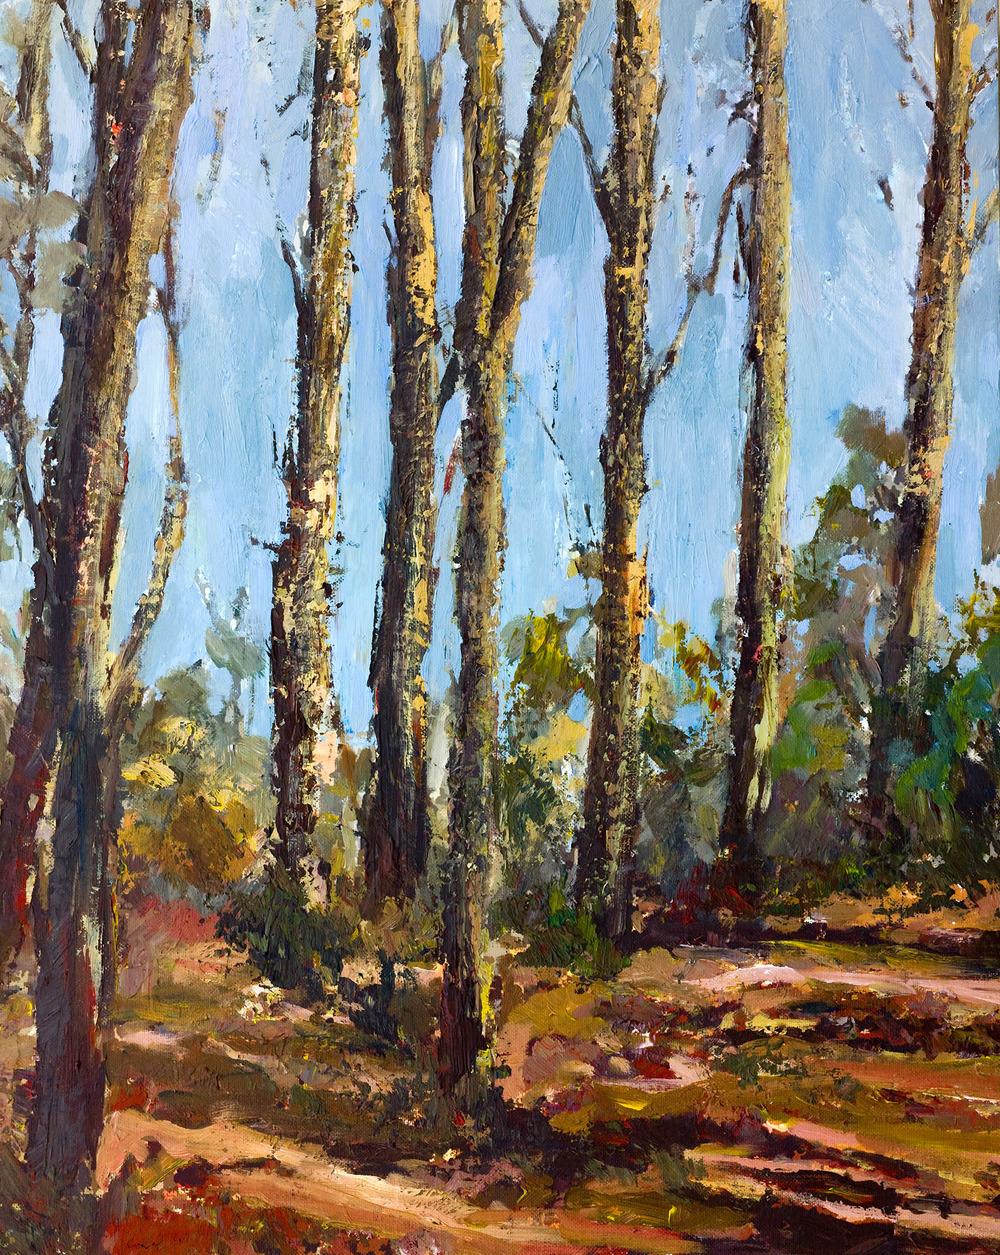 Trees III by John Beard.jpg